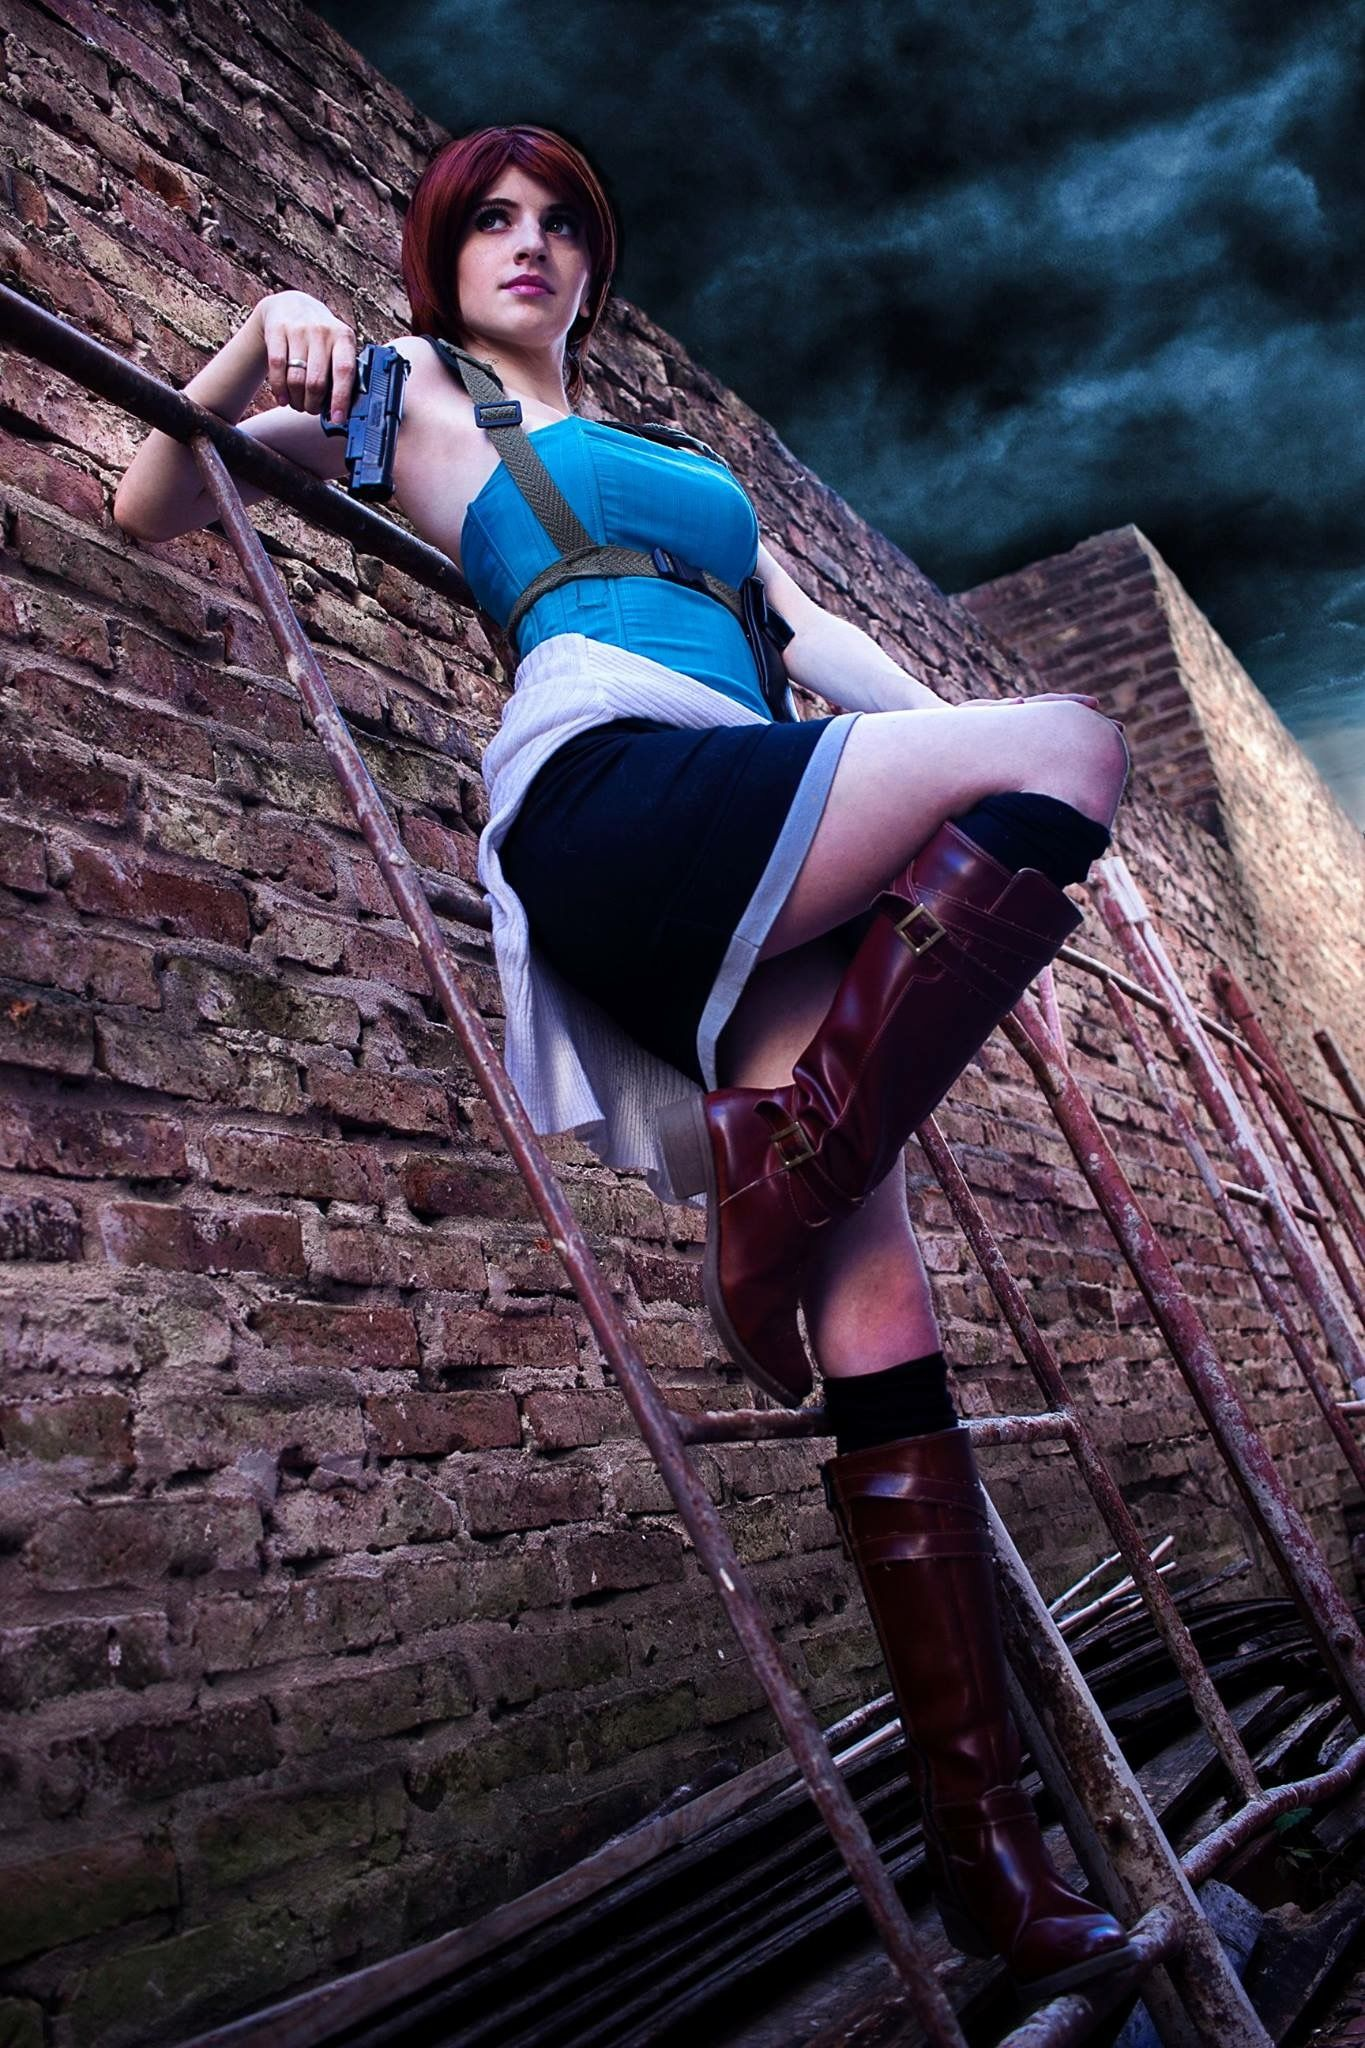 Resident evil jill valentine cosplay nude